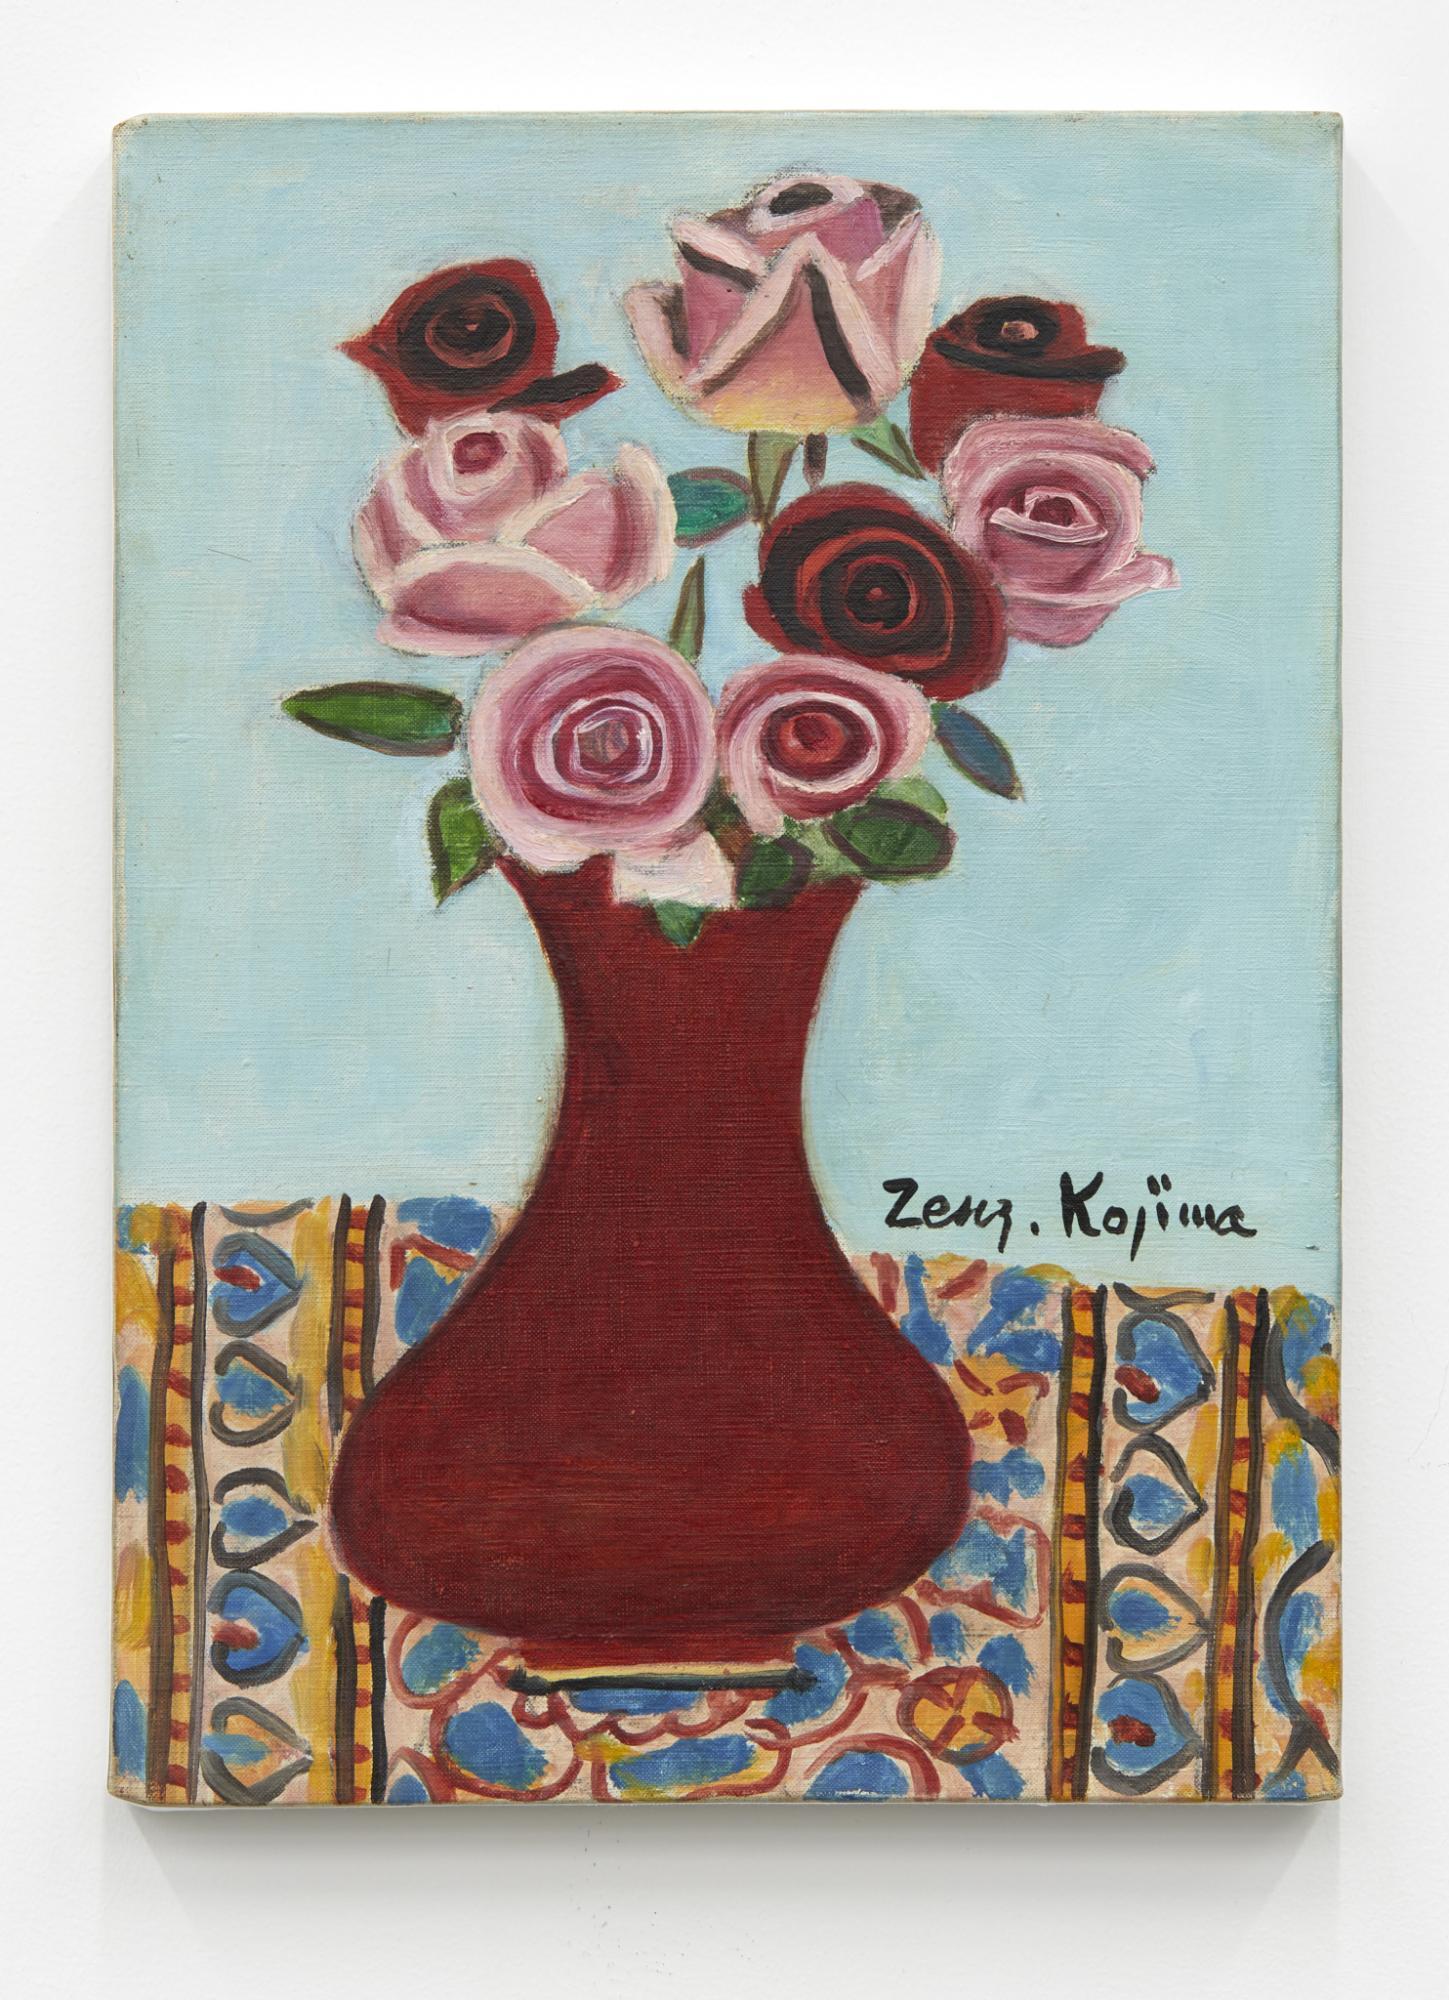 Zenzaburo Kojima,/Roses/, 1960, oil on canvas, 34× 25cm